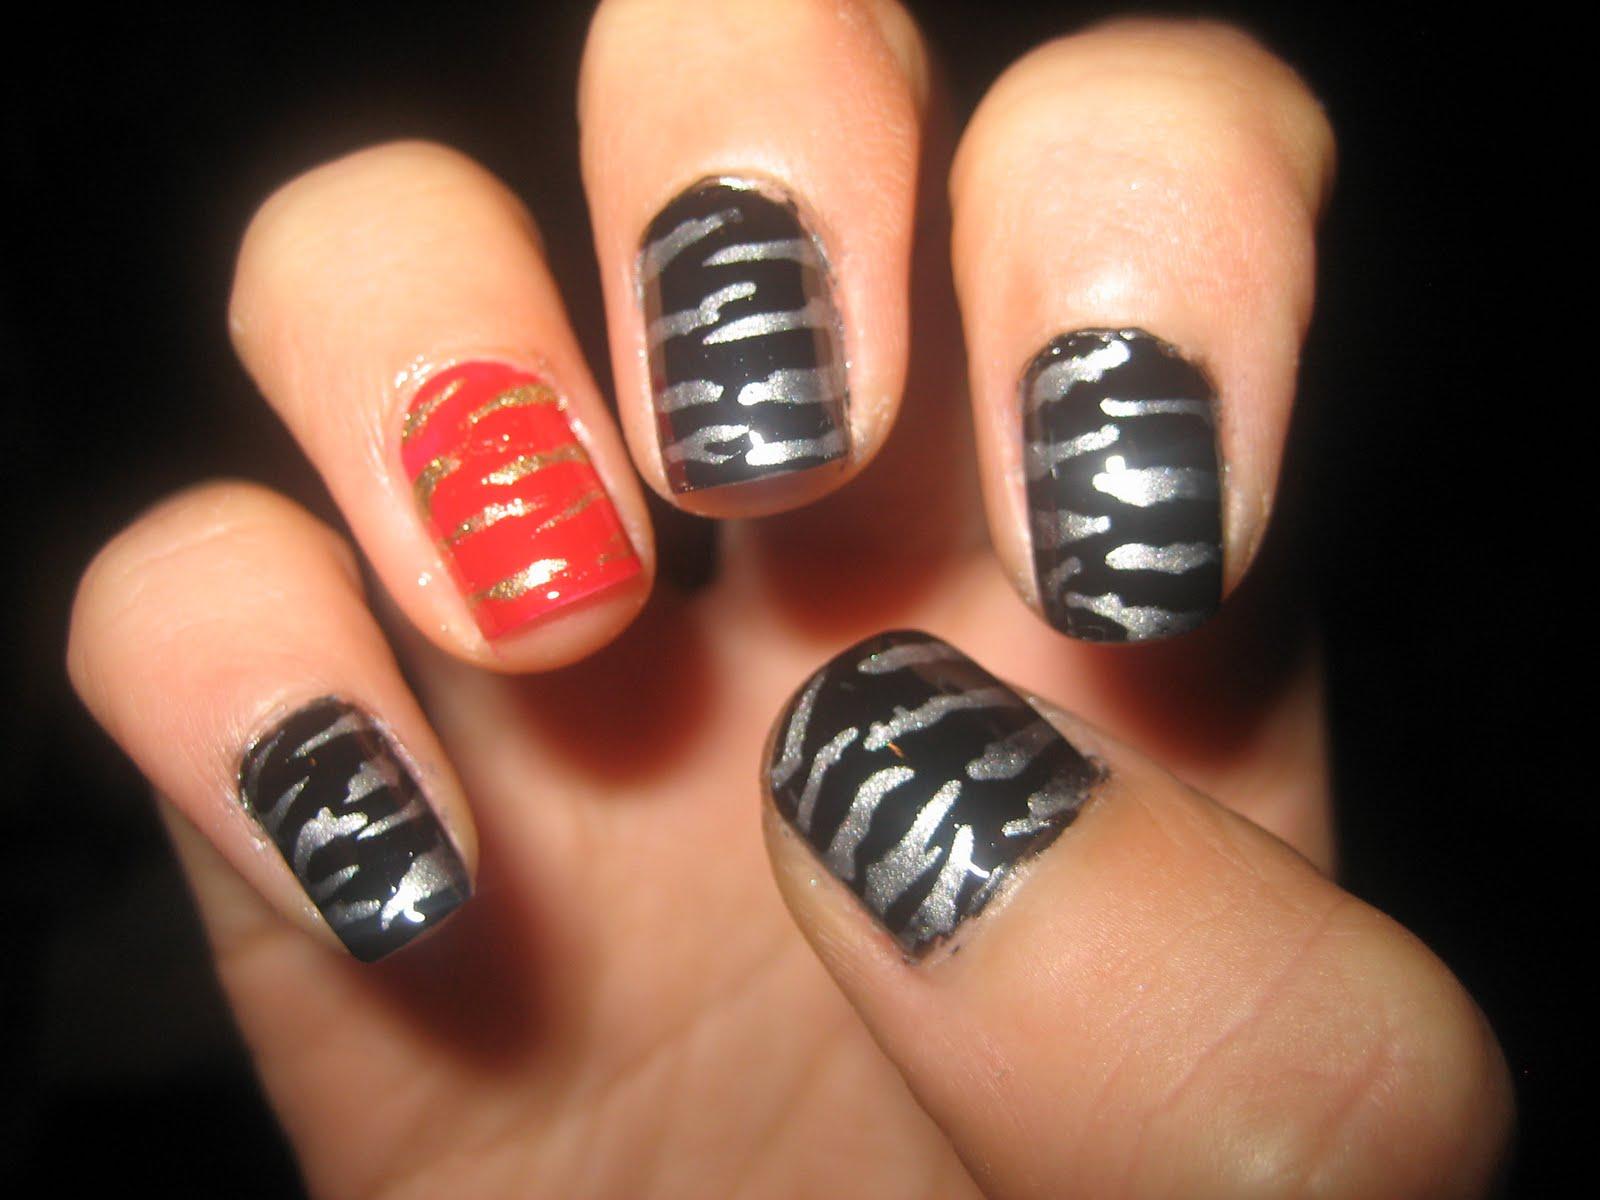 Polish for the MMASSes: Shake It Up Nails! - photo #37